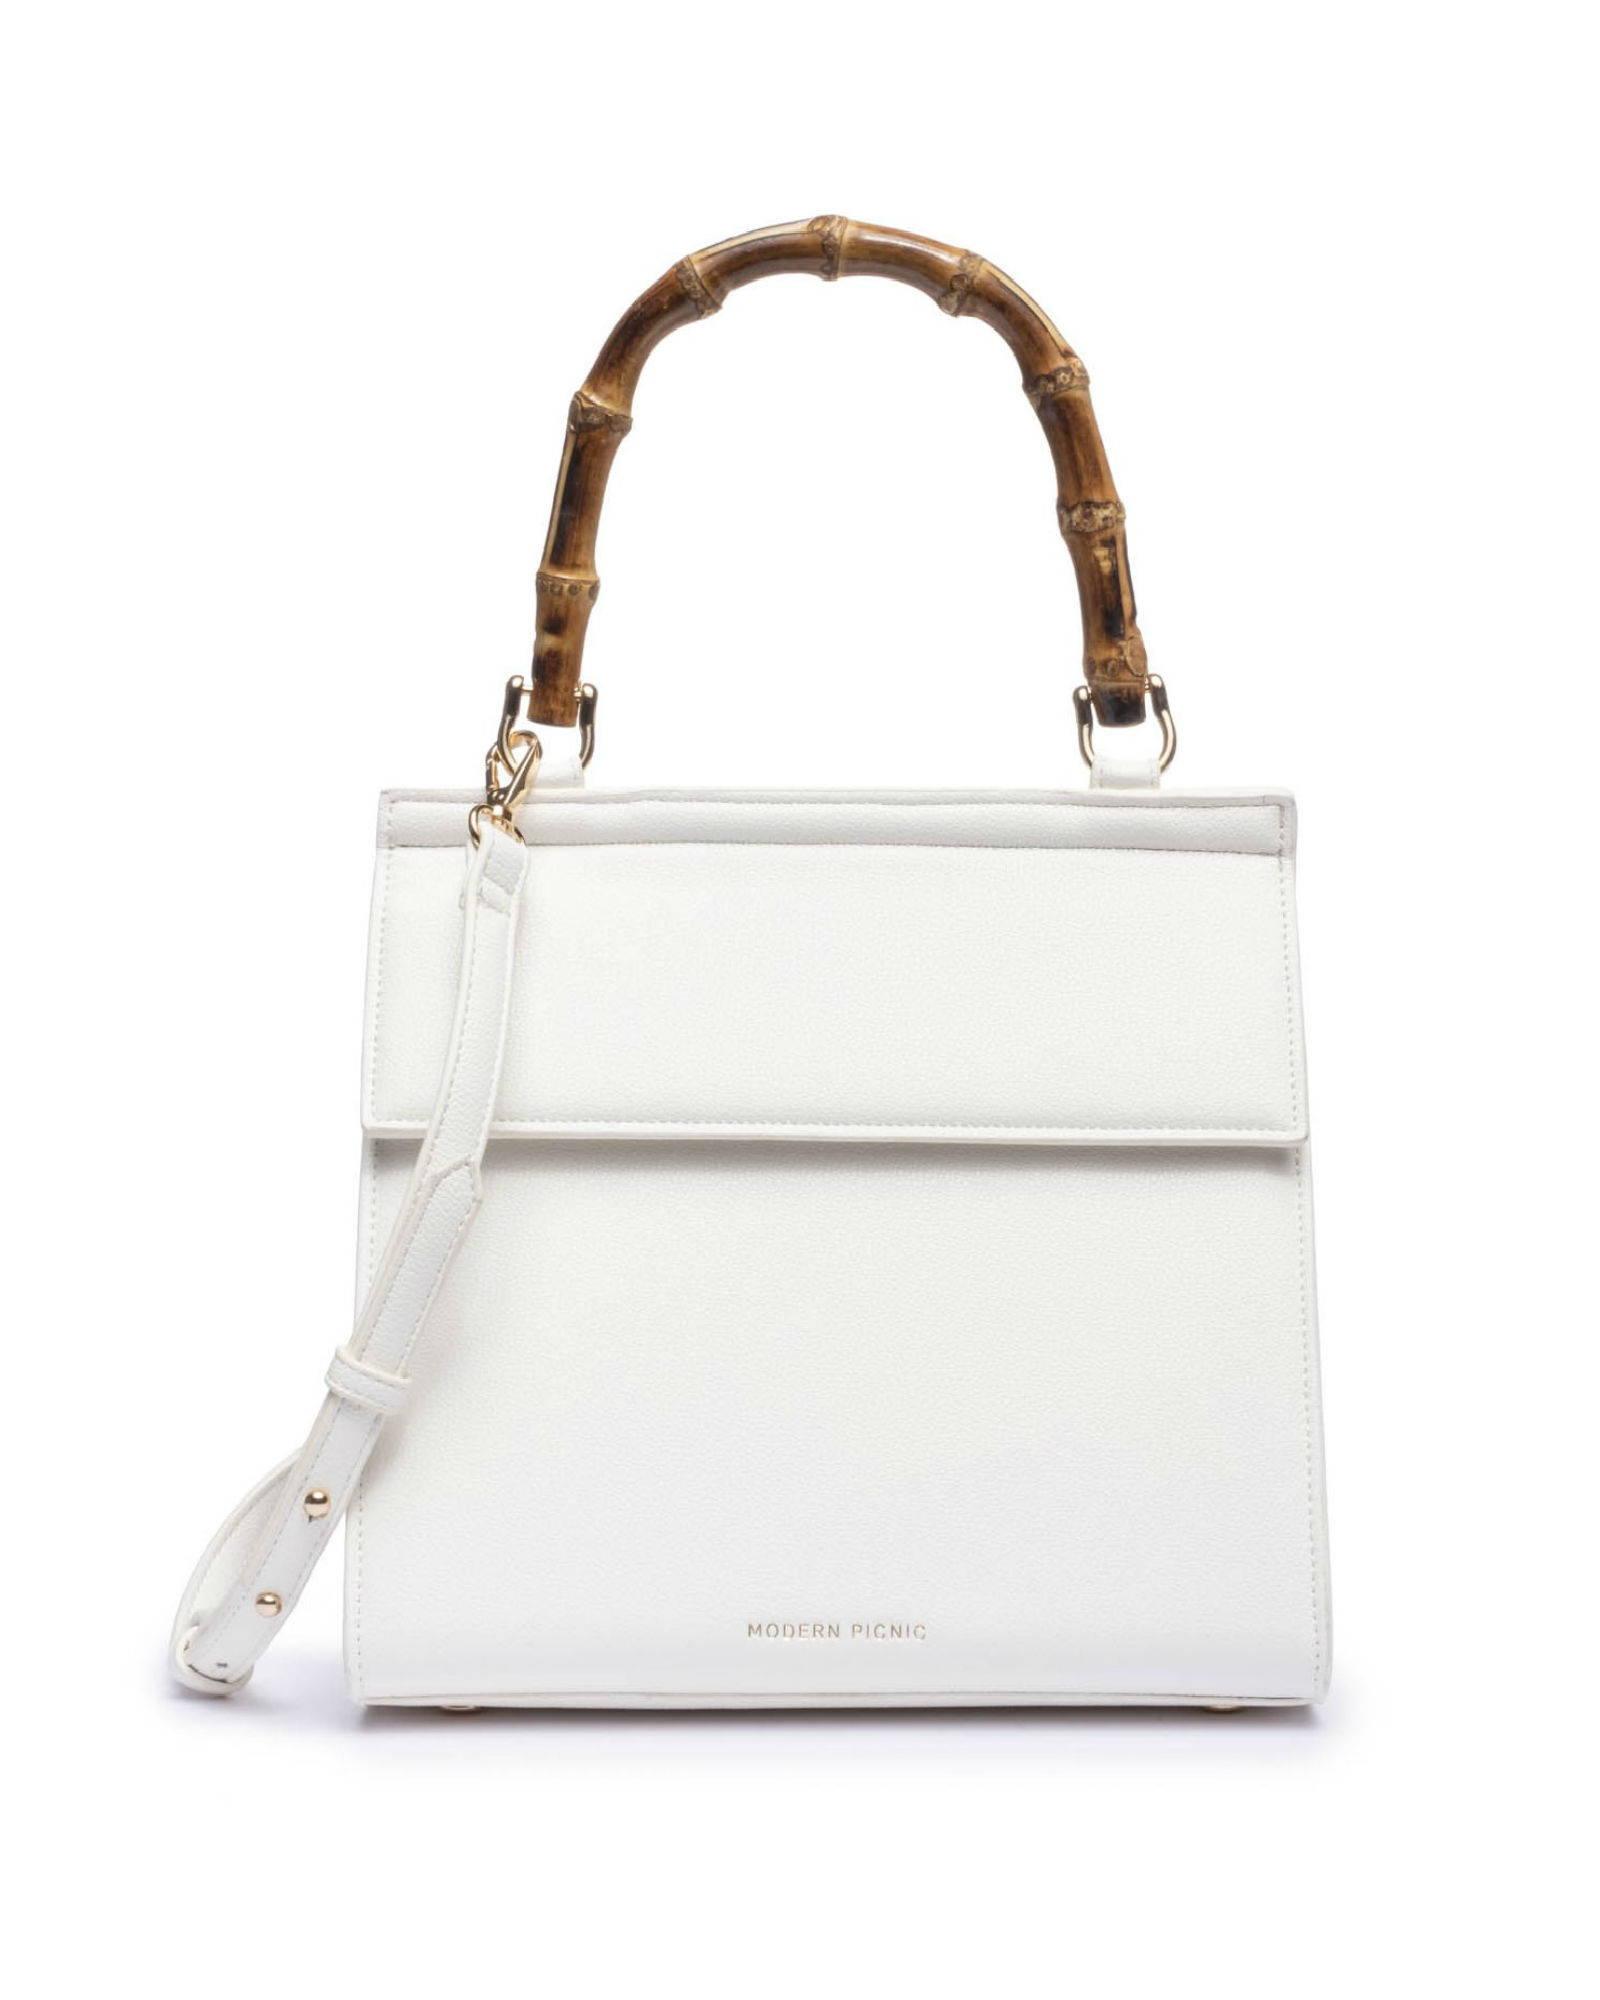 LUNCH BOX PURSE - WHITE BAMBOO LUNCHER - ModernPicnic.com